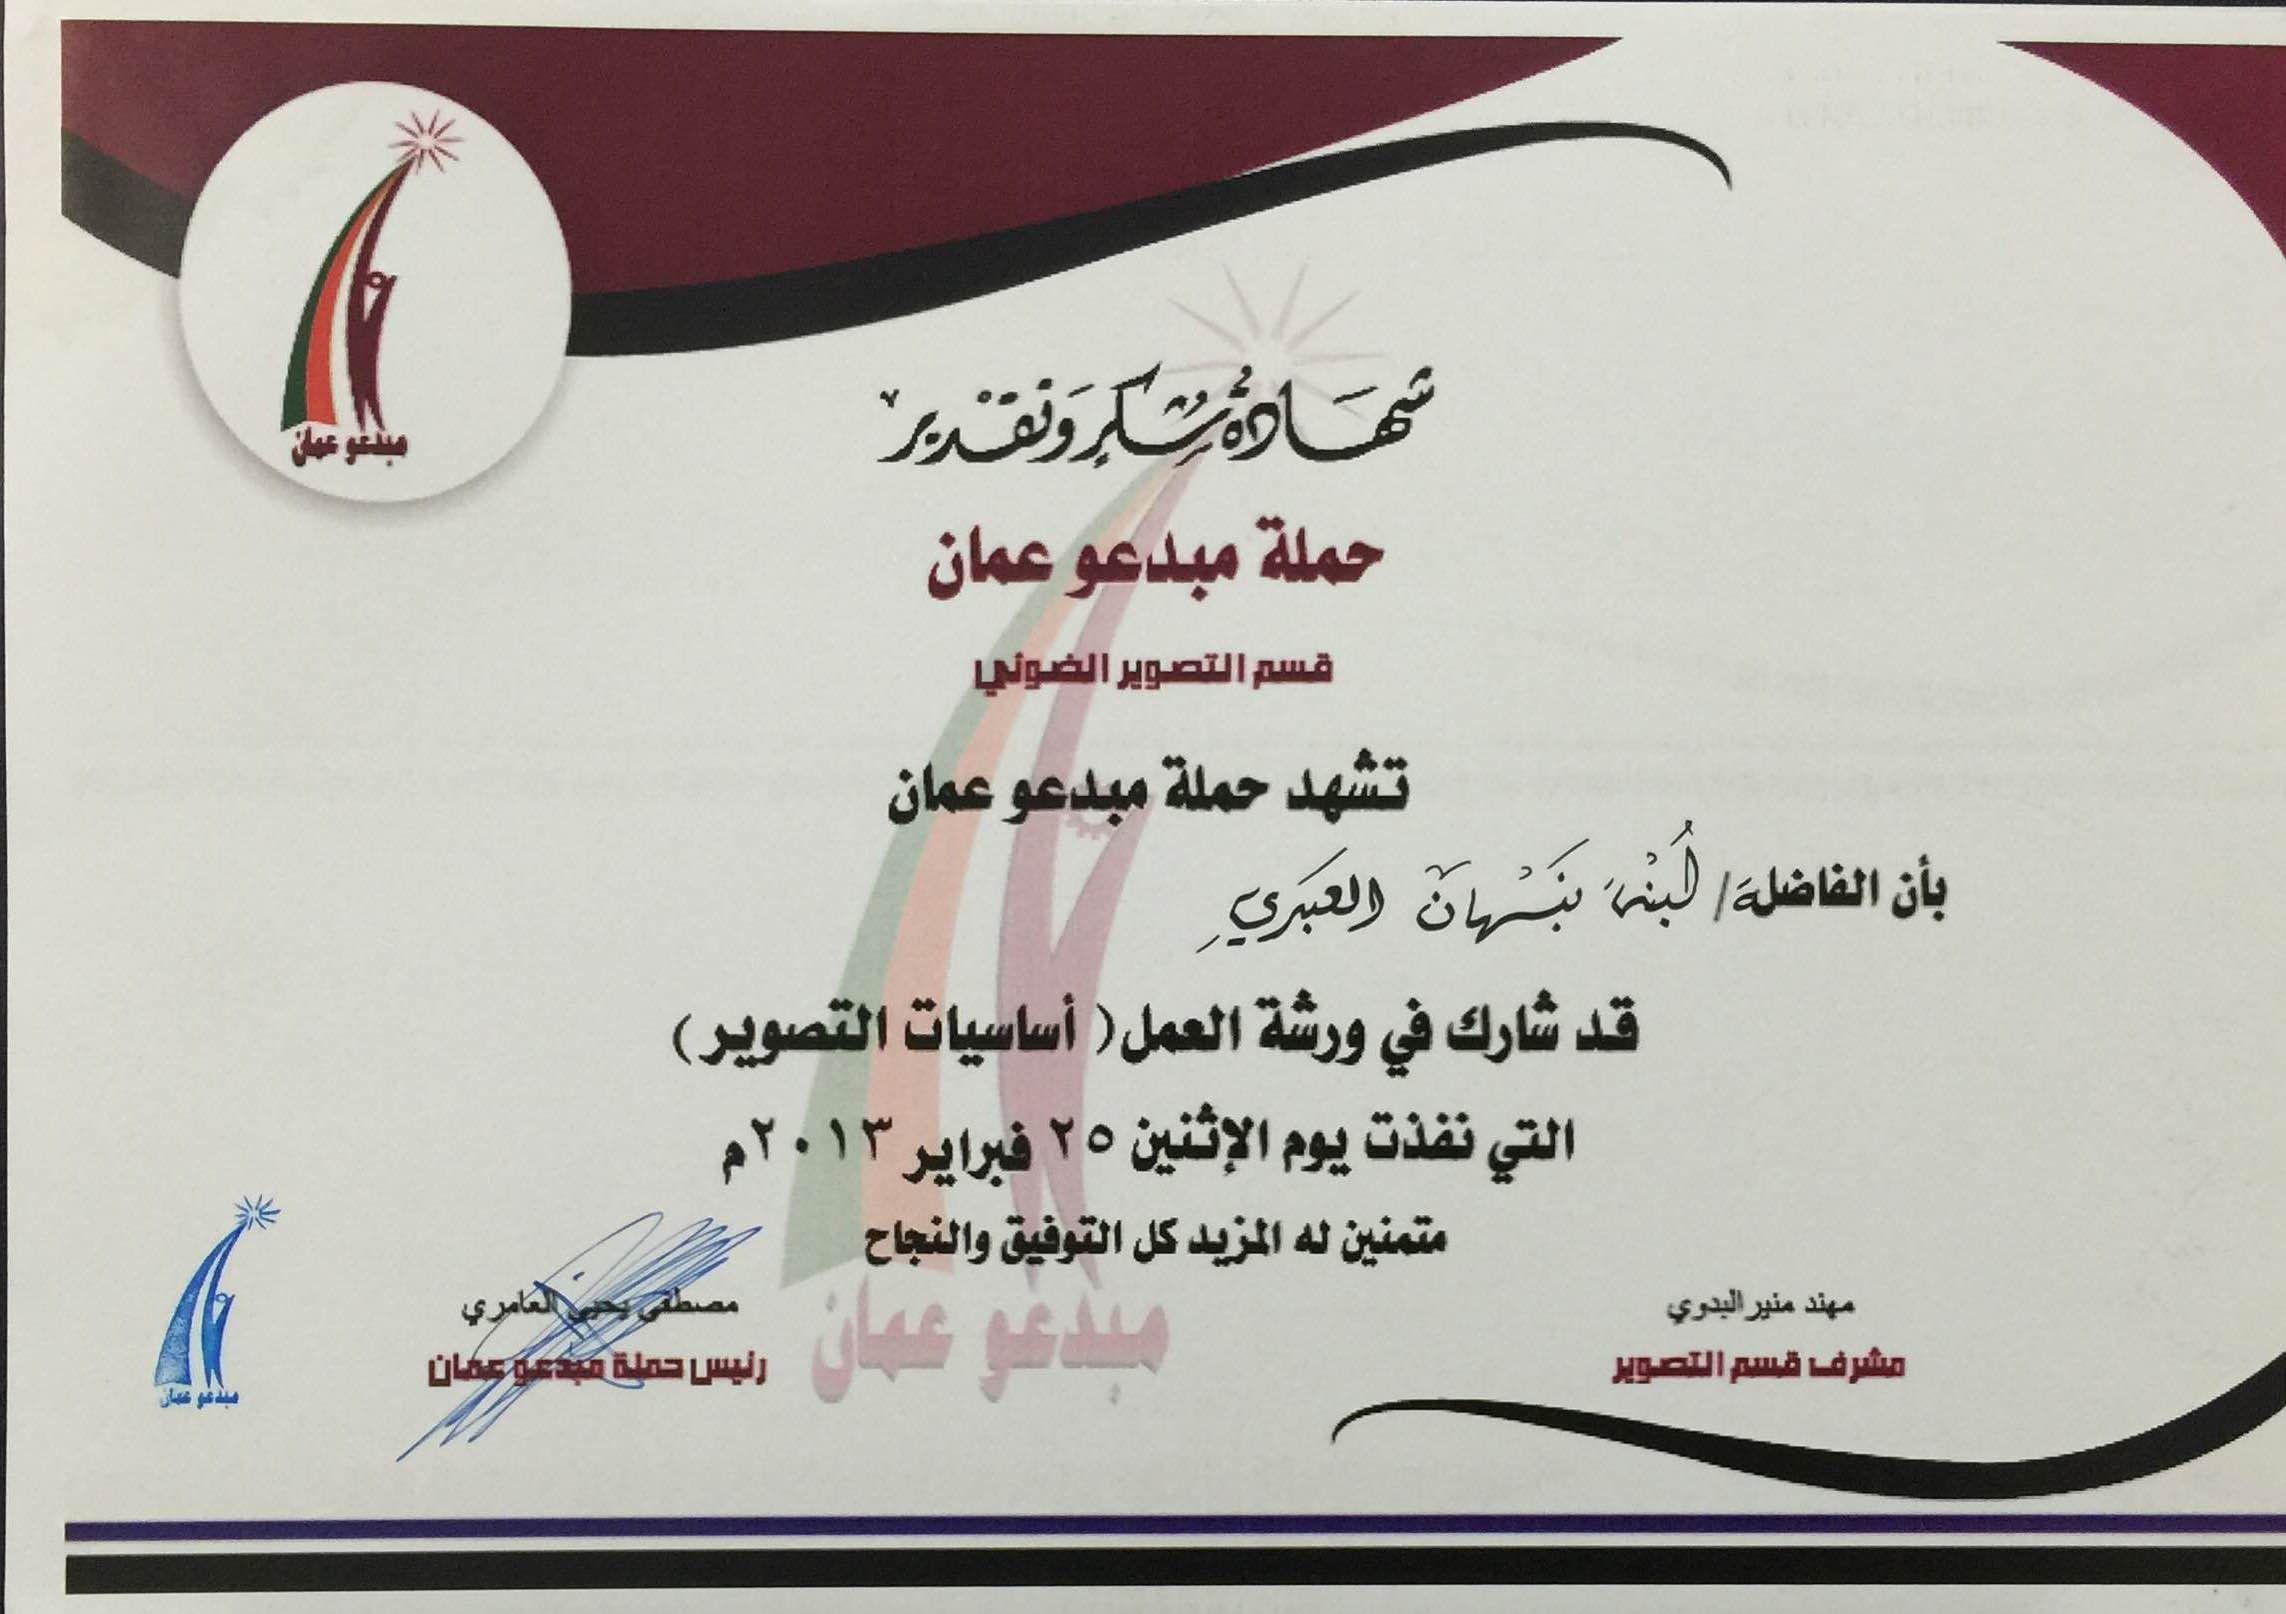 شهادة مشاركه في حملة مبدعو عمان Education Projects To Try Arabic